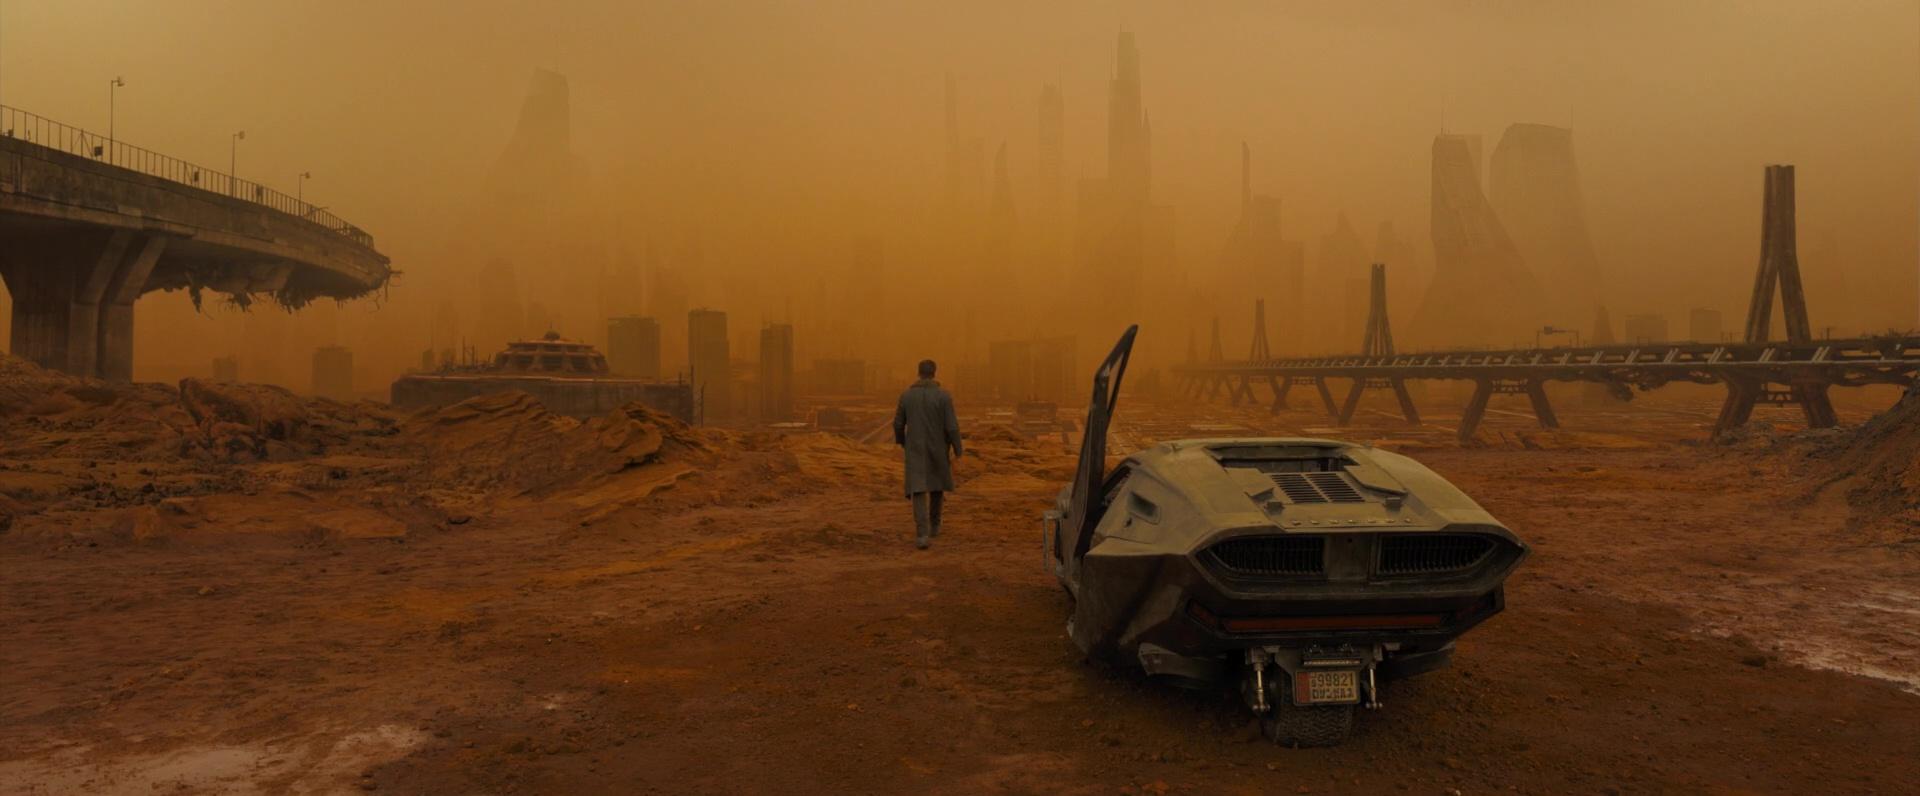 Seen In The Movie Peugeot Car Used By Ryan Gosling In